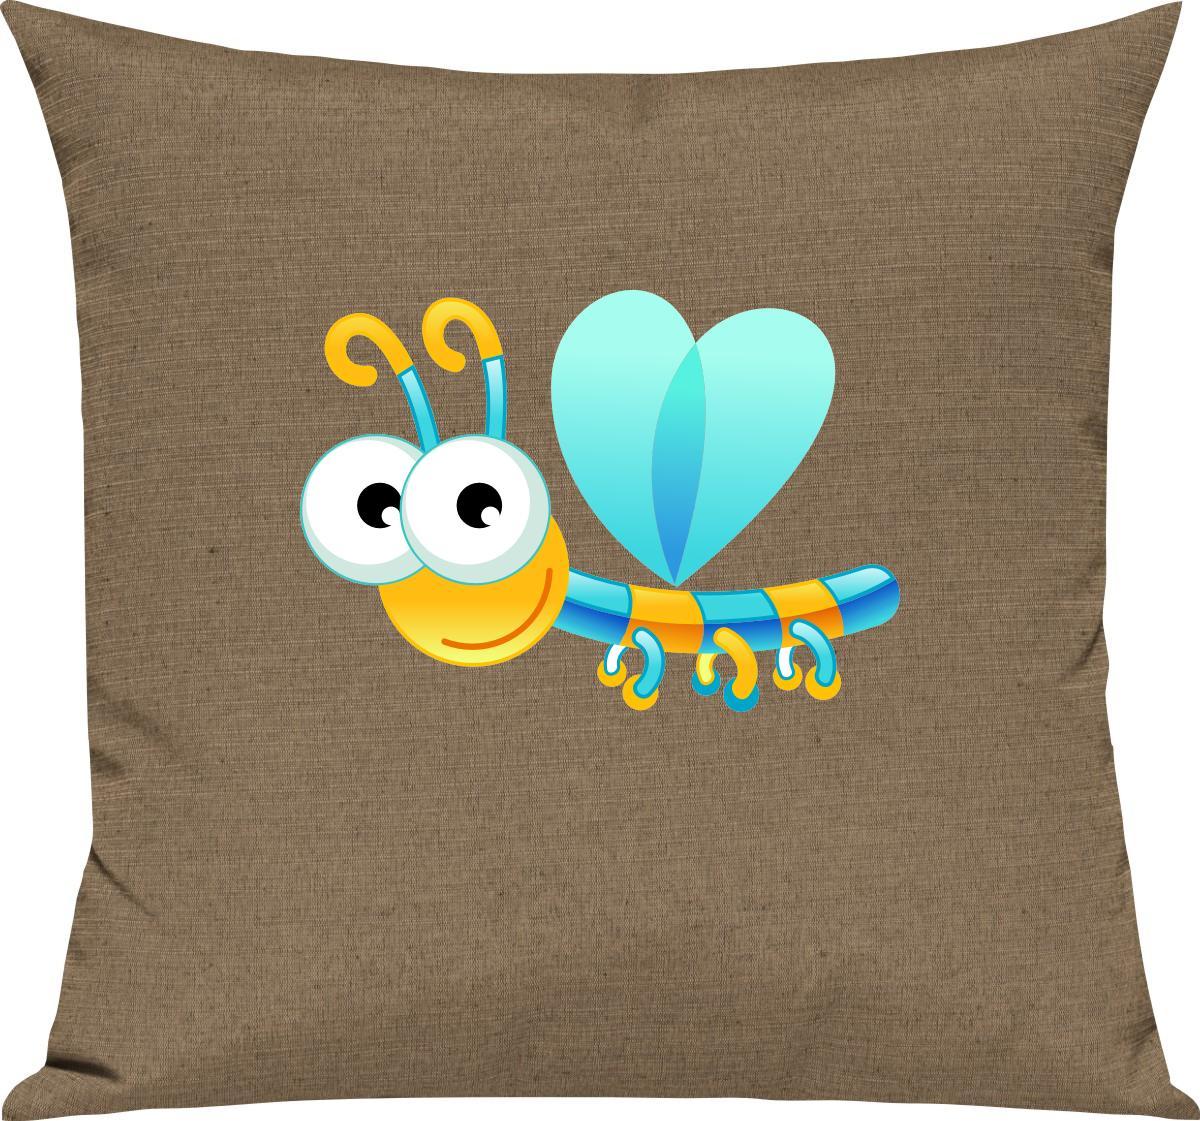 Indexbild 8 - Kinder Kissen, Libelle Insekt Tiere Tier Natur, Kuschelkissen Couch Deko,